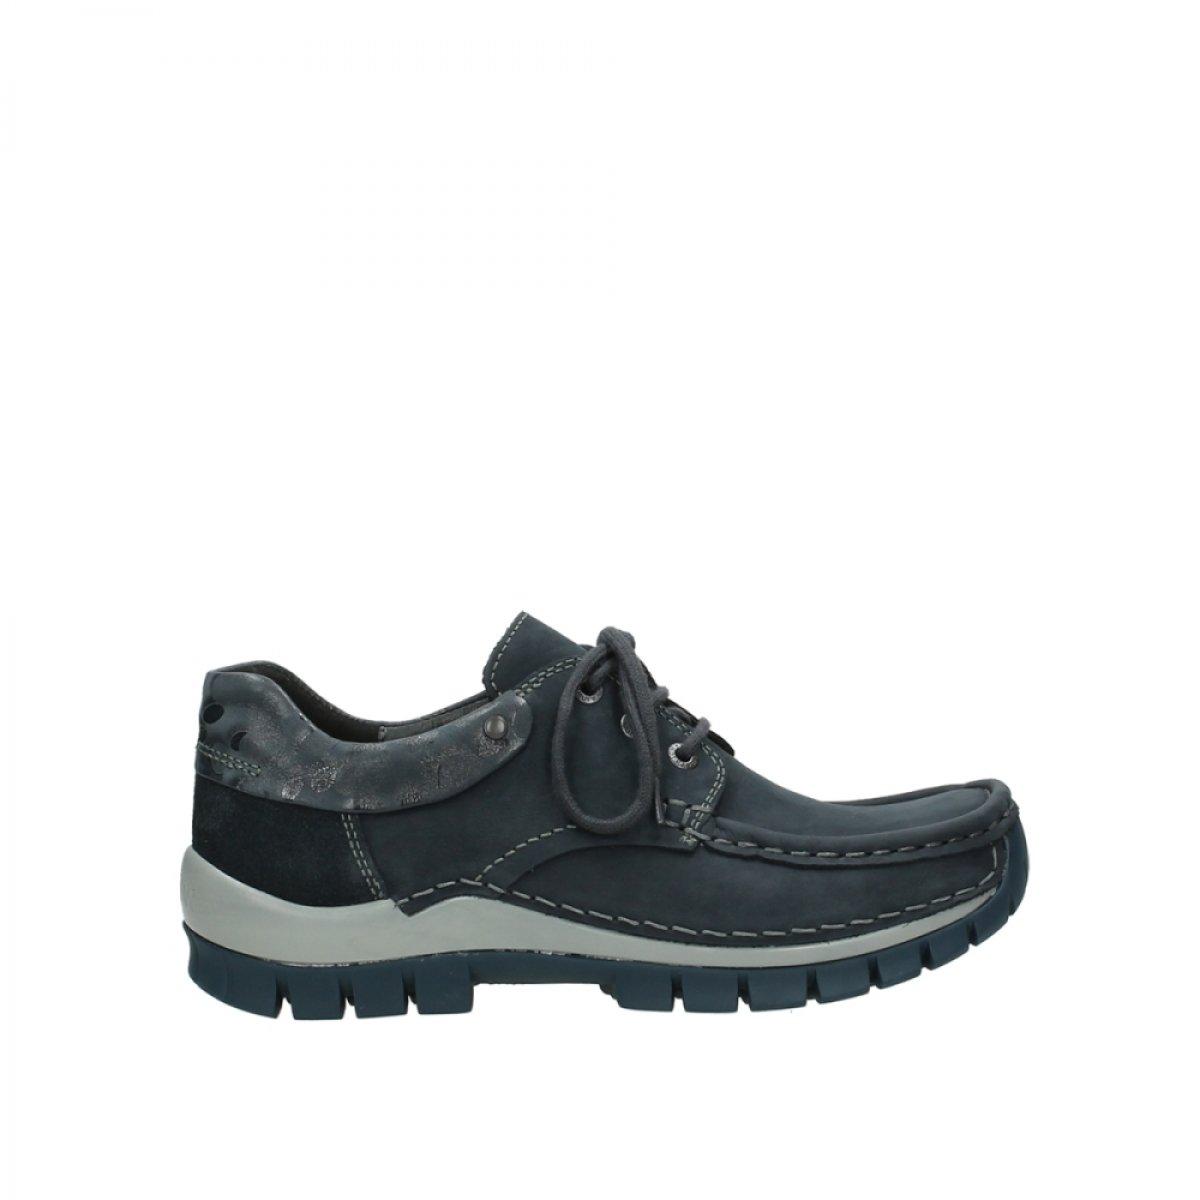 Wolky Womens Rio Leather Sandals 40 EU|59800 Blau Leder